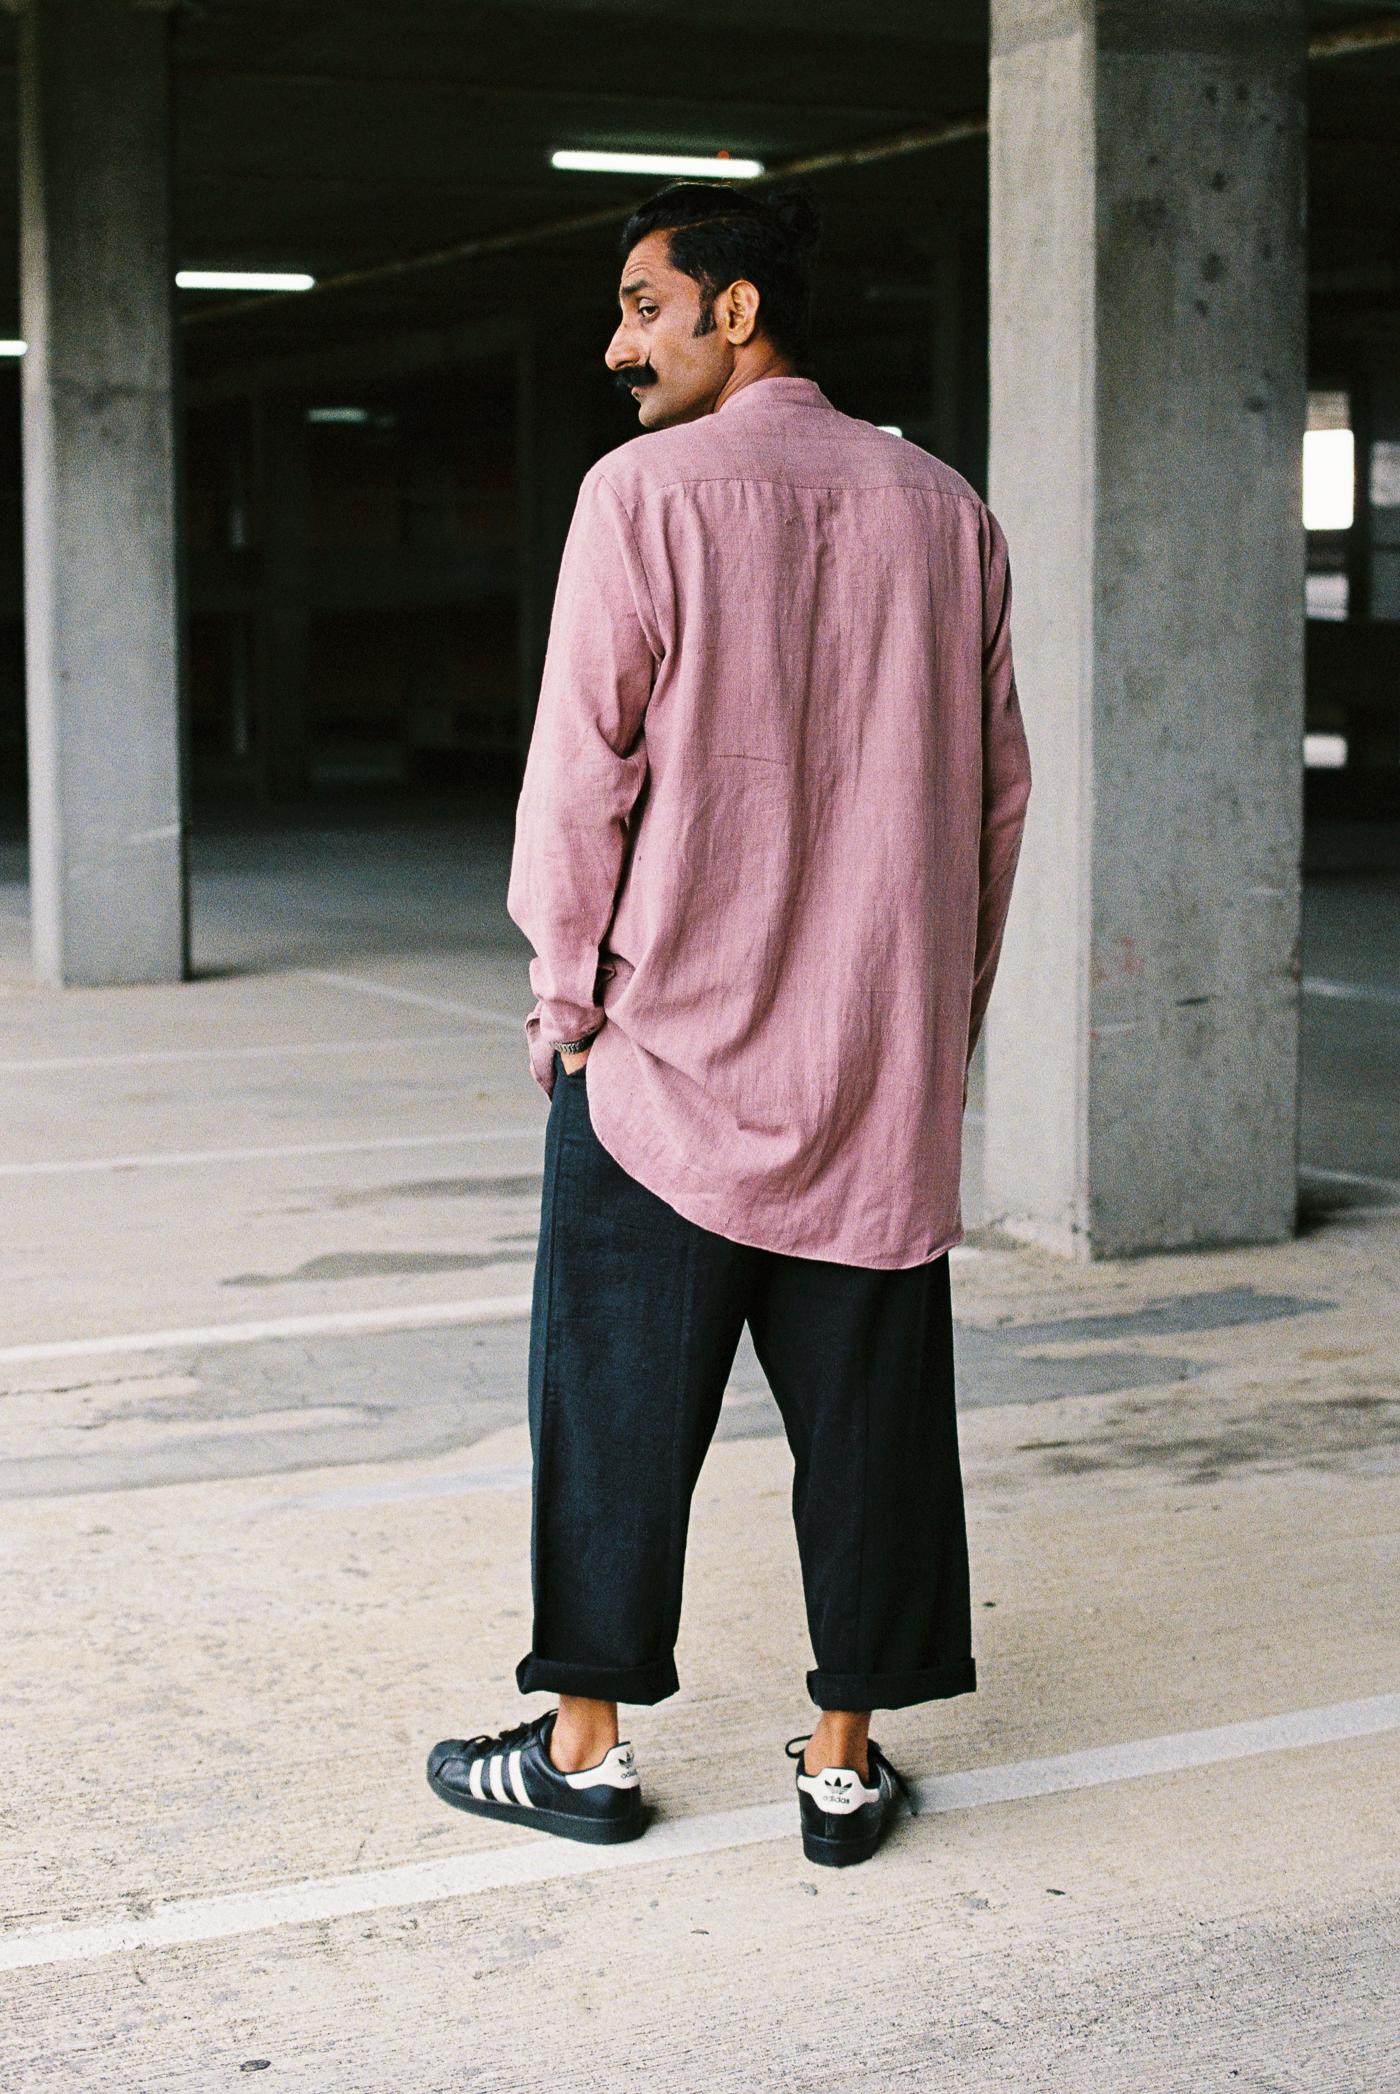 pinkshirtblackpants-1.jpg